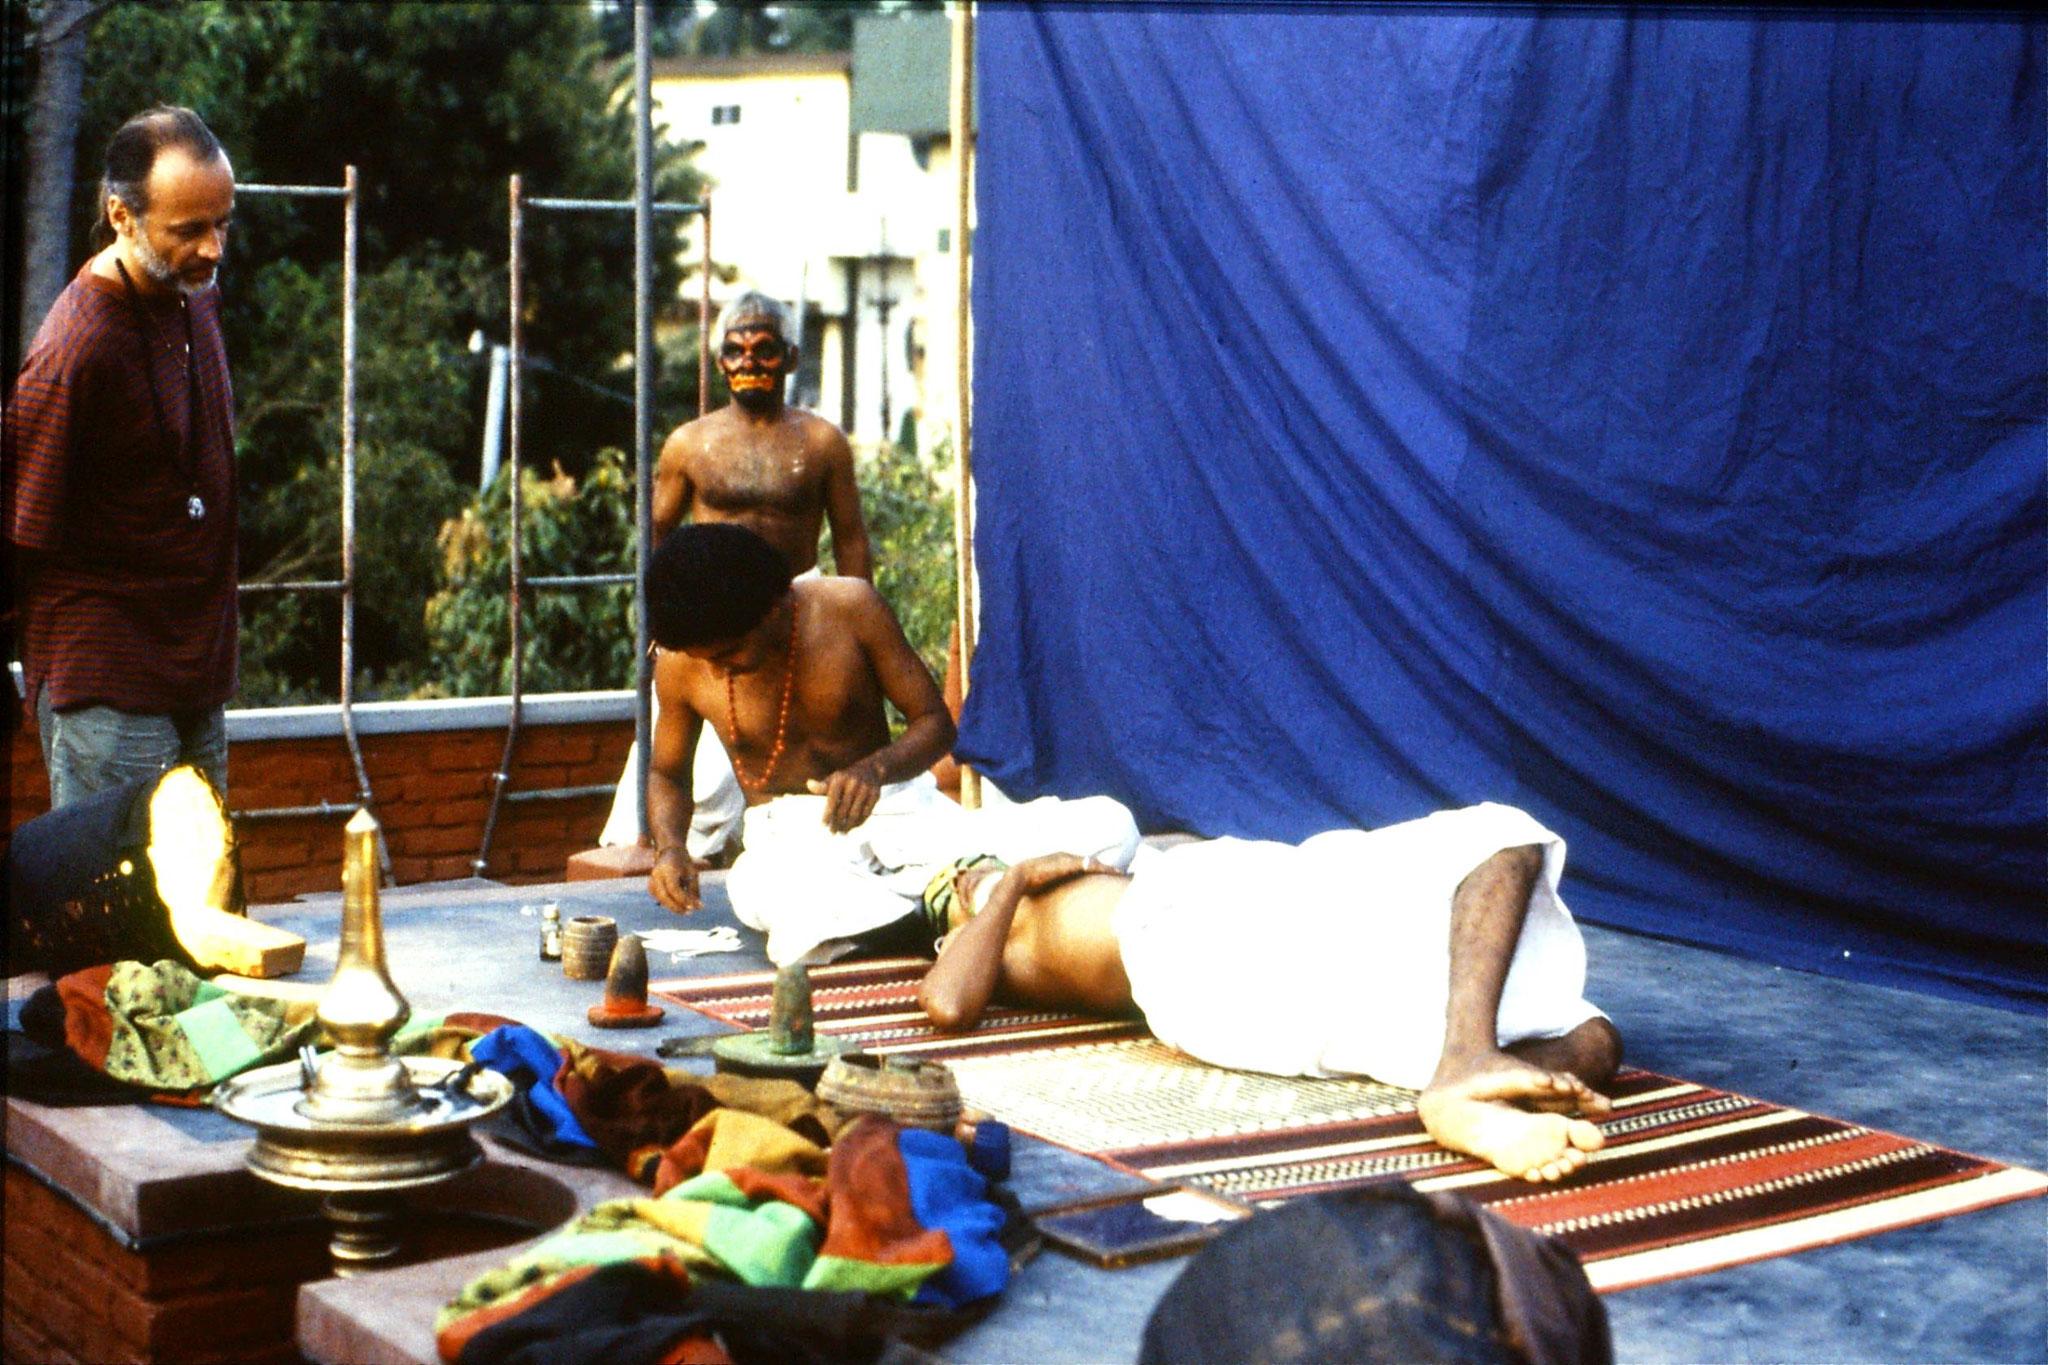 106/16: 24/2/1990 Erkunaculum - See India Foundation - Make up - Kathakali Dance